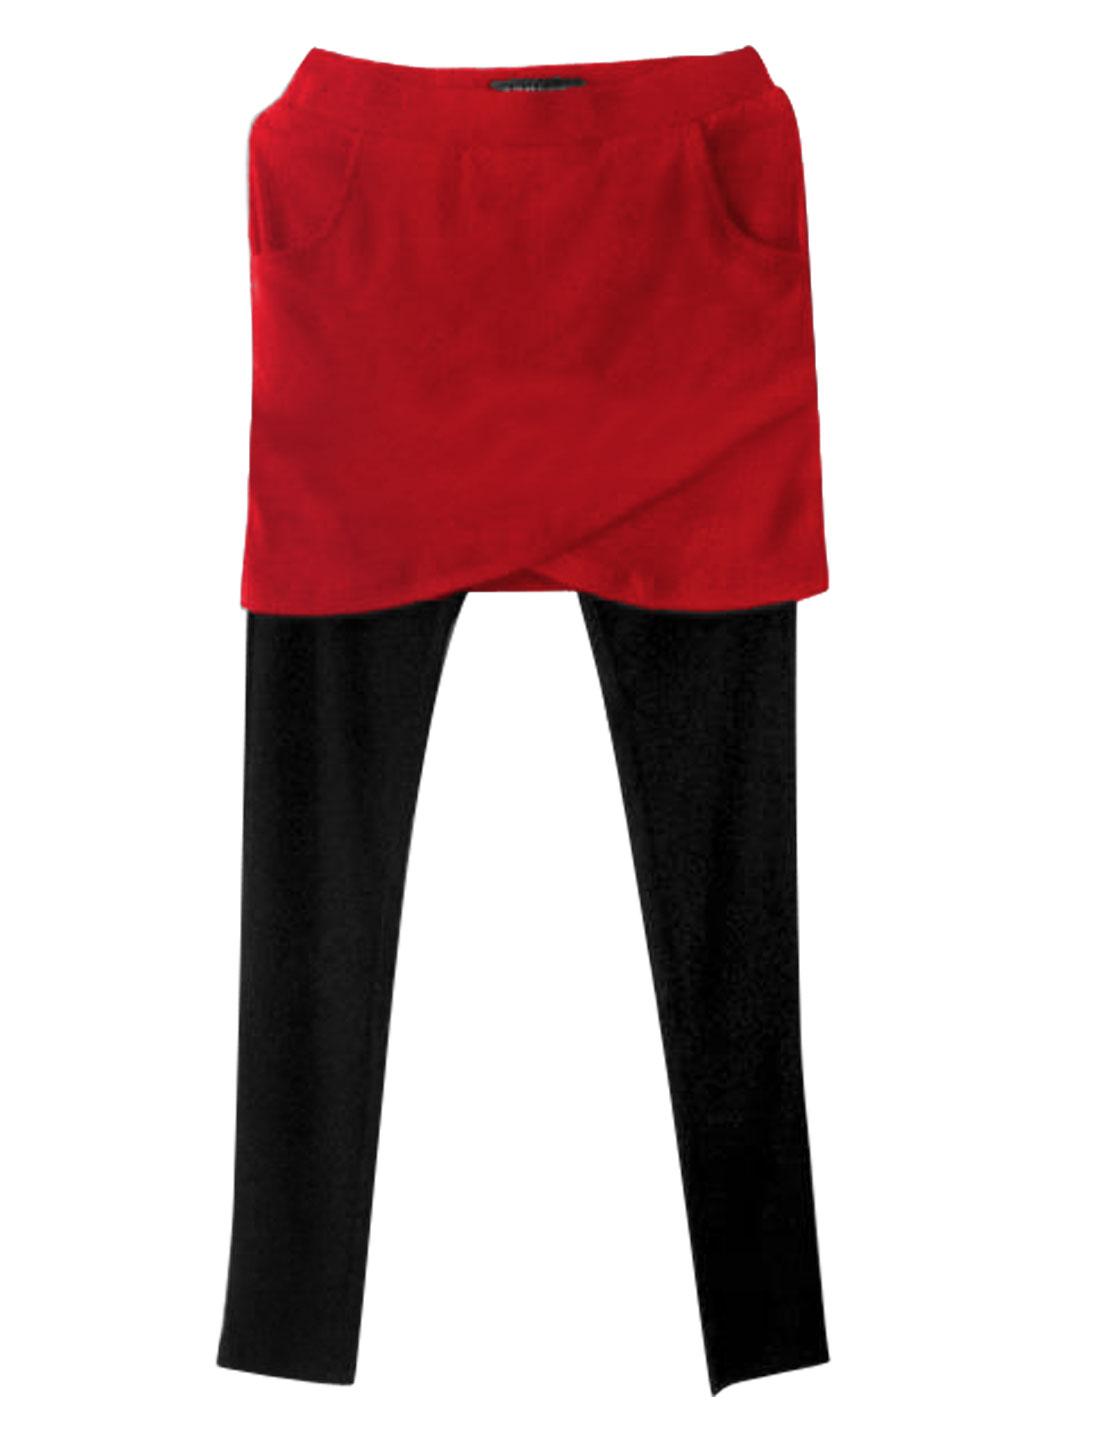 Women Crossover Design Stretchy Wasit Skinny Skirt Leggings Red Black XS